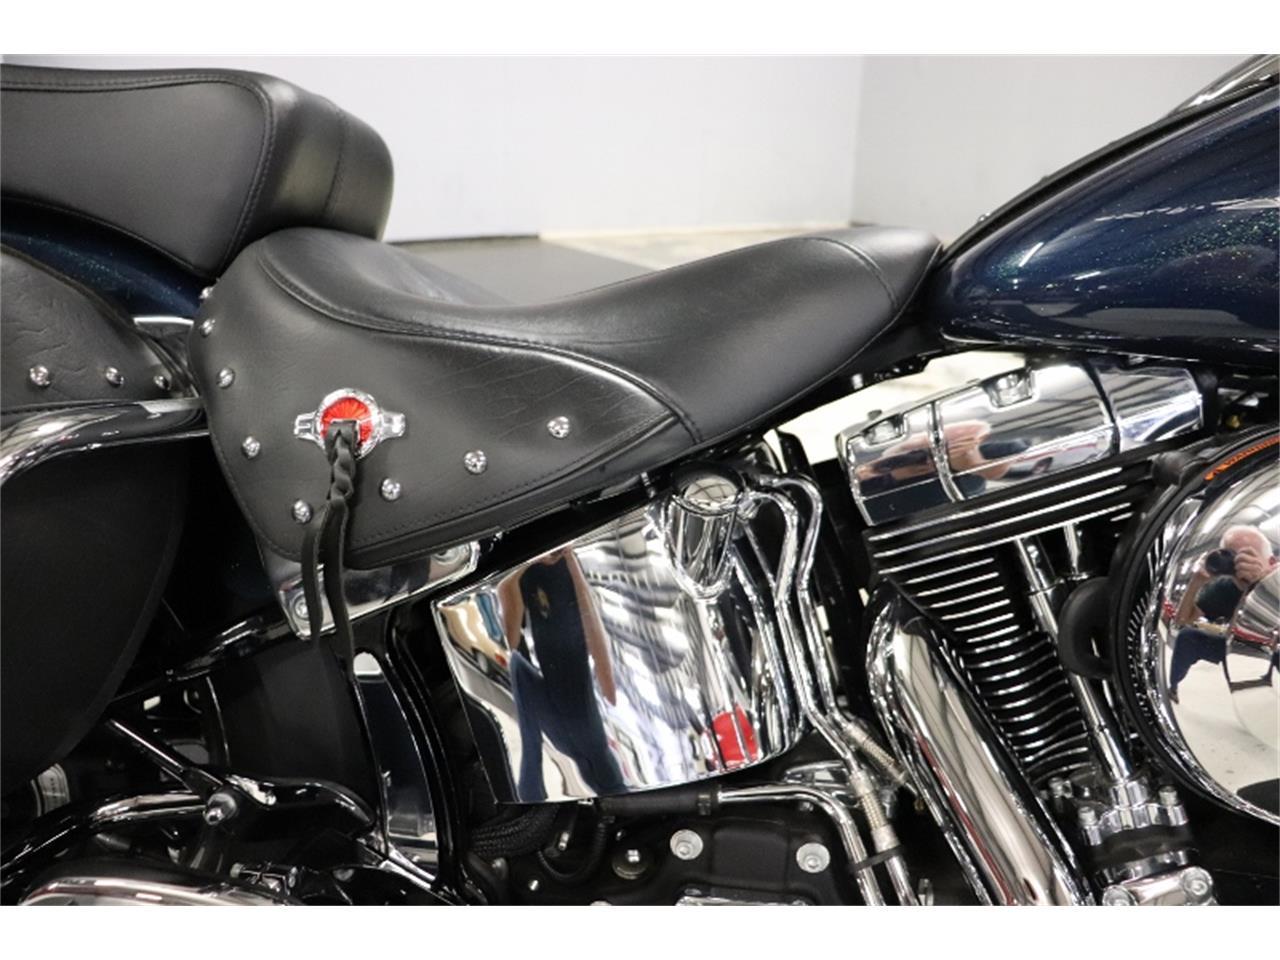 2016 Harley-Davidson Heritage Softail (CC-1308457) for sale in Lillington, North Carolina